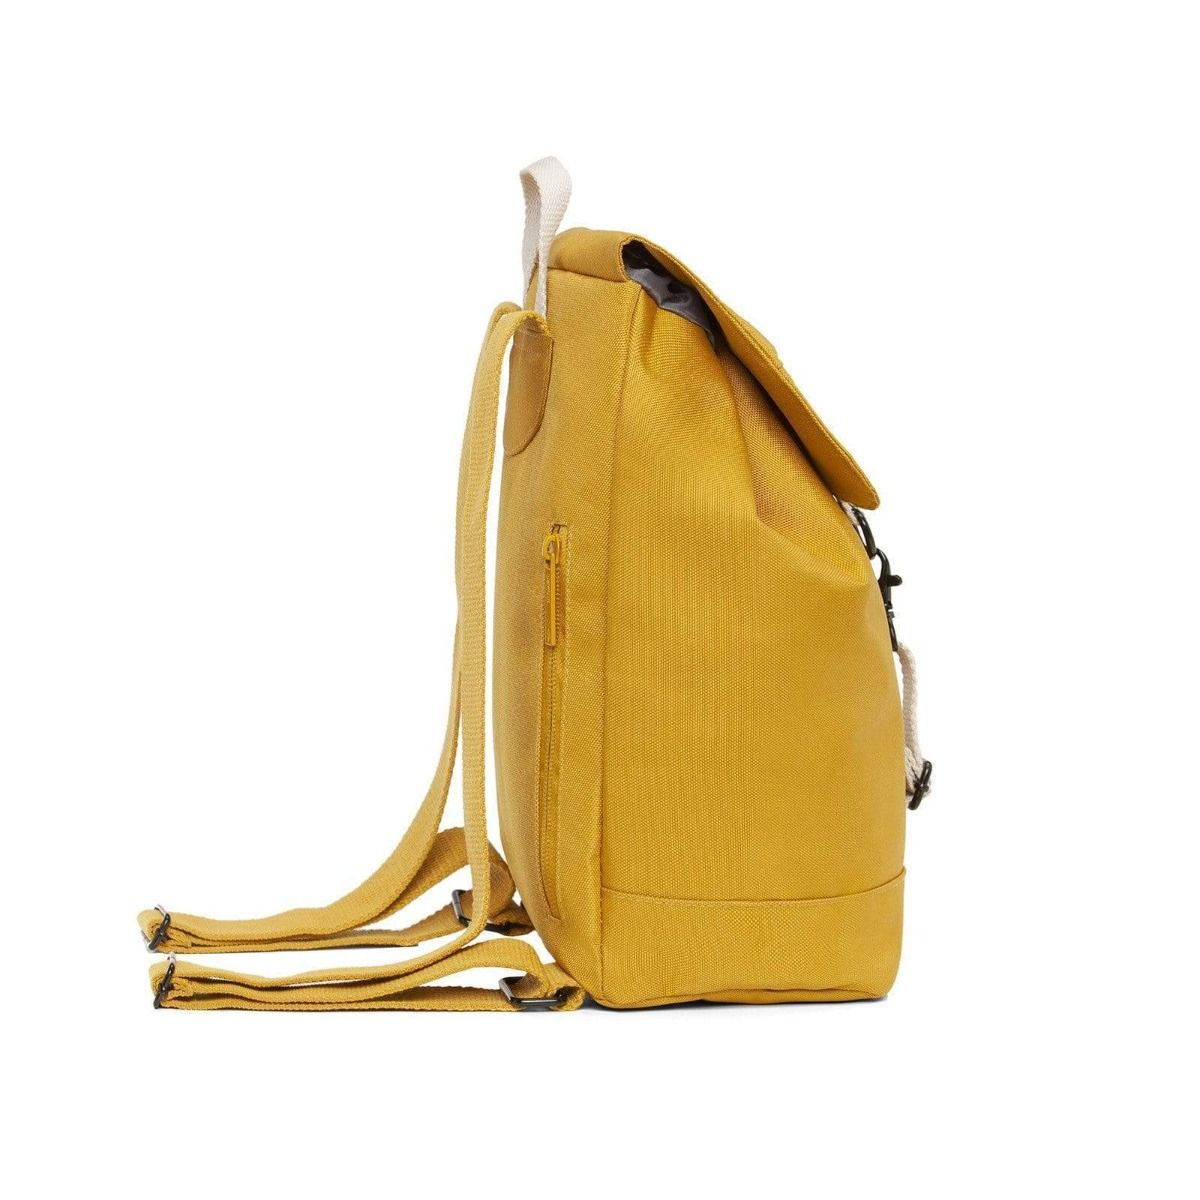 Lefrik Scout Mini Rucksack in Mustard